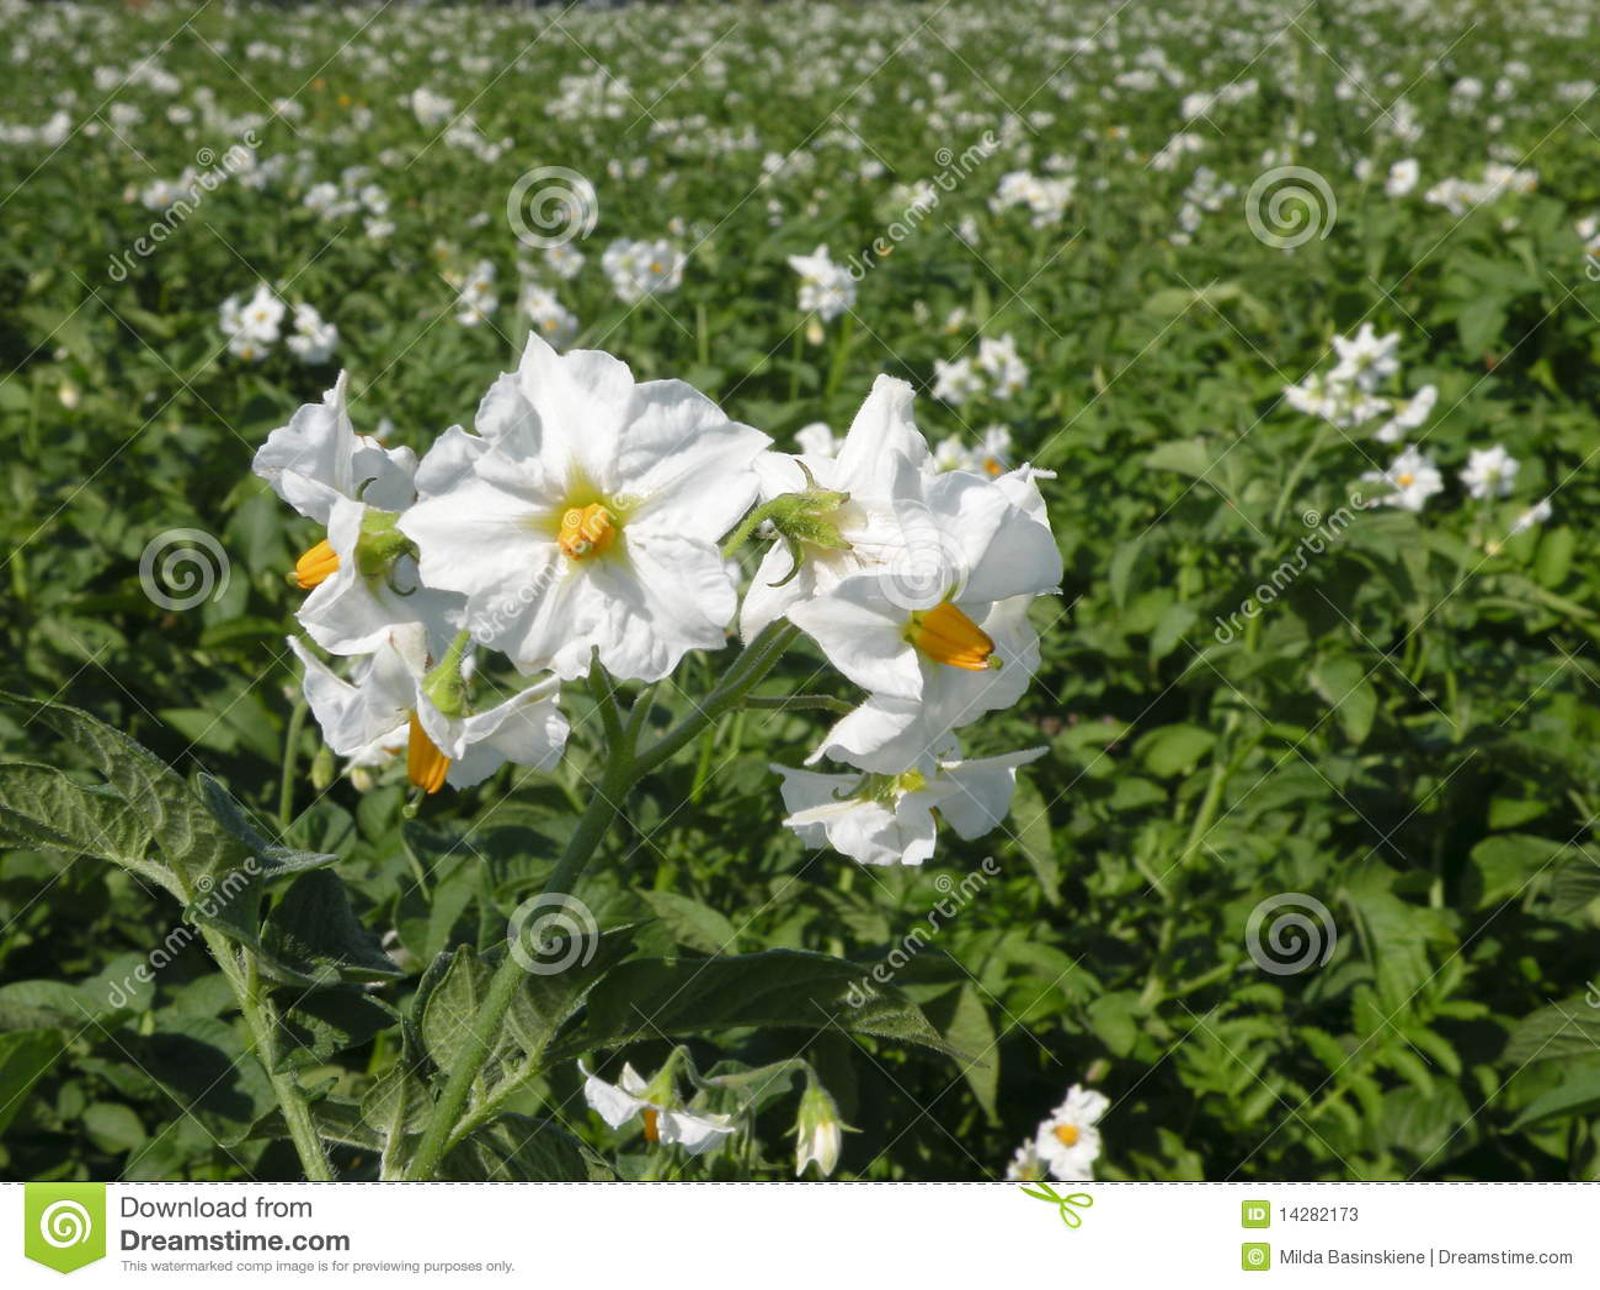 fleur de pommes de terre image stock image du agriculture 14282173. Black Bedroom Furniture Sets. Home Design Ideas